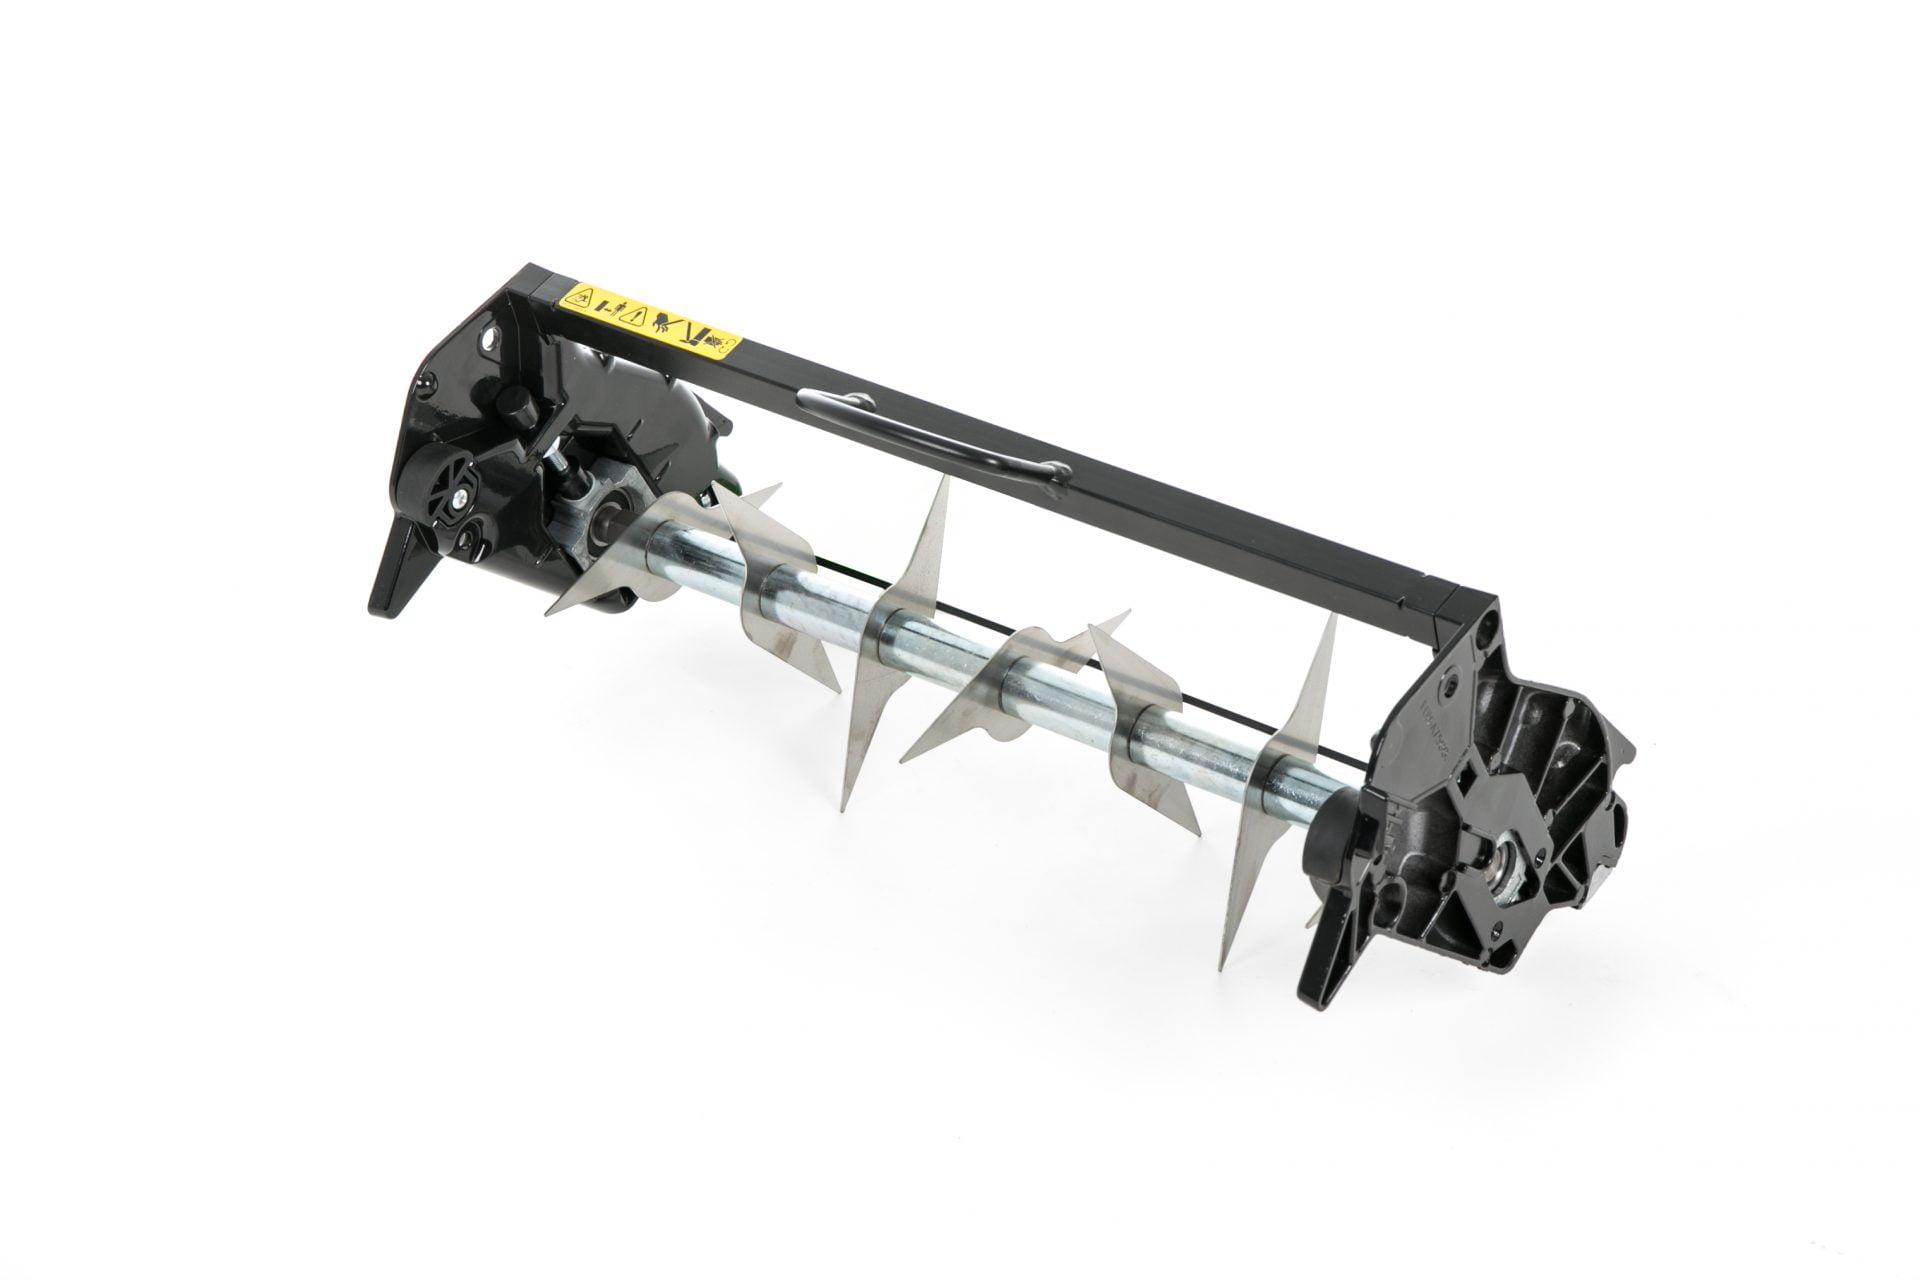 Allett 17 inch Aerator Quick Change Cartridge